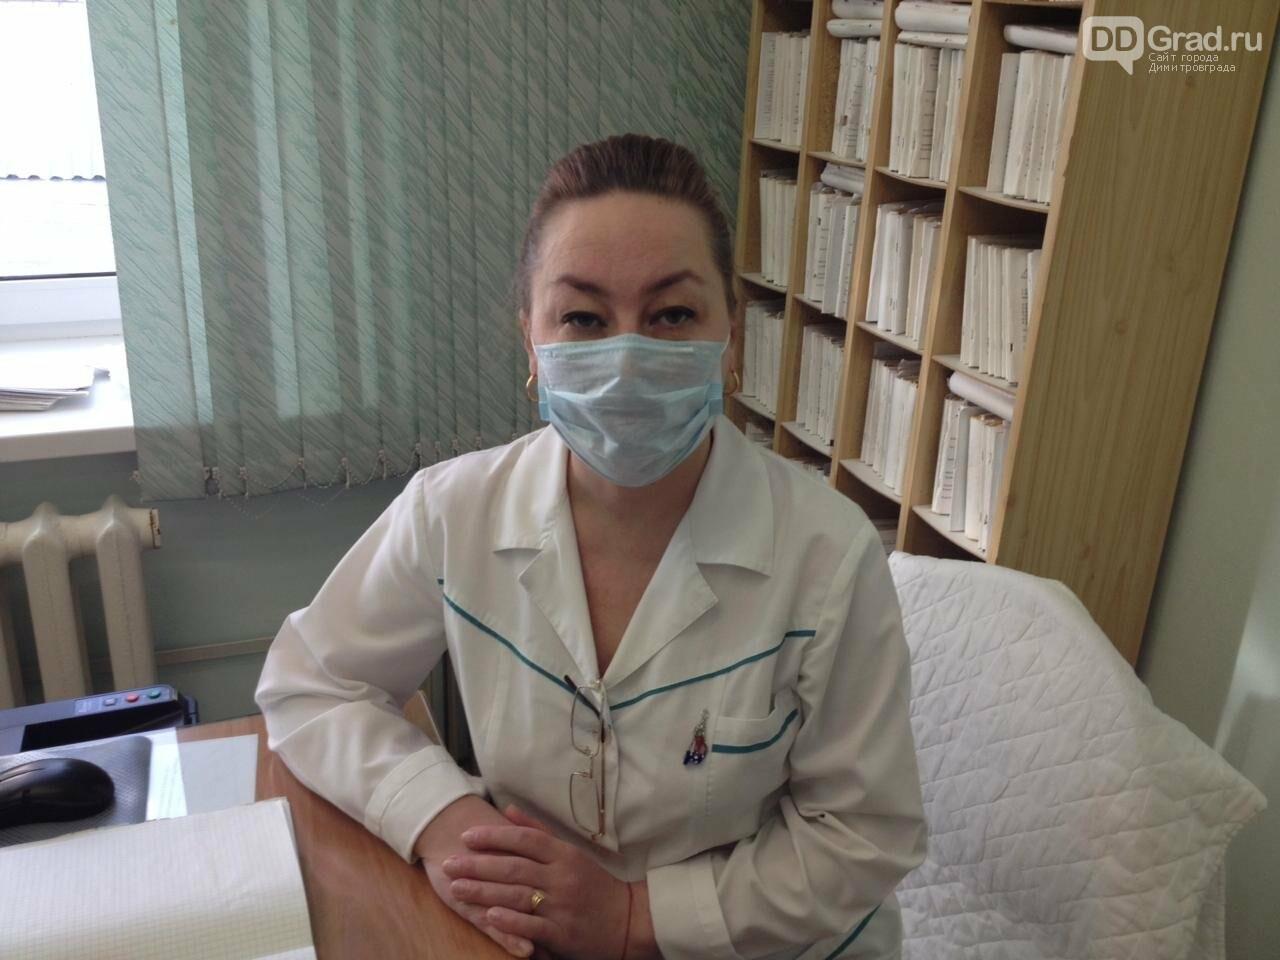 Гульнара Наильевна Вафина